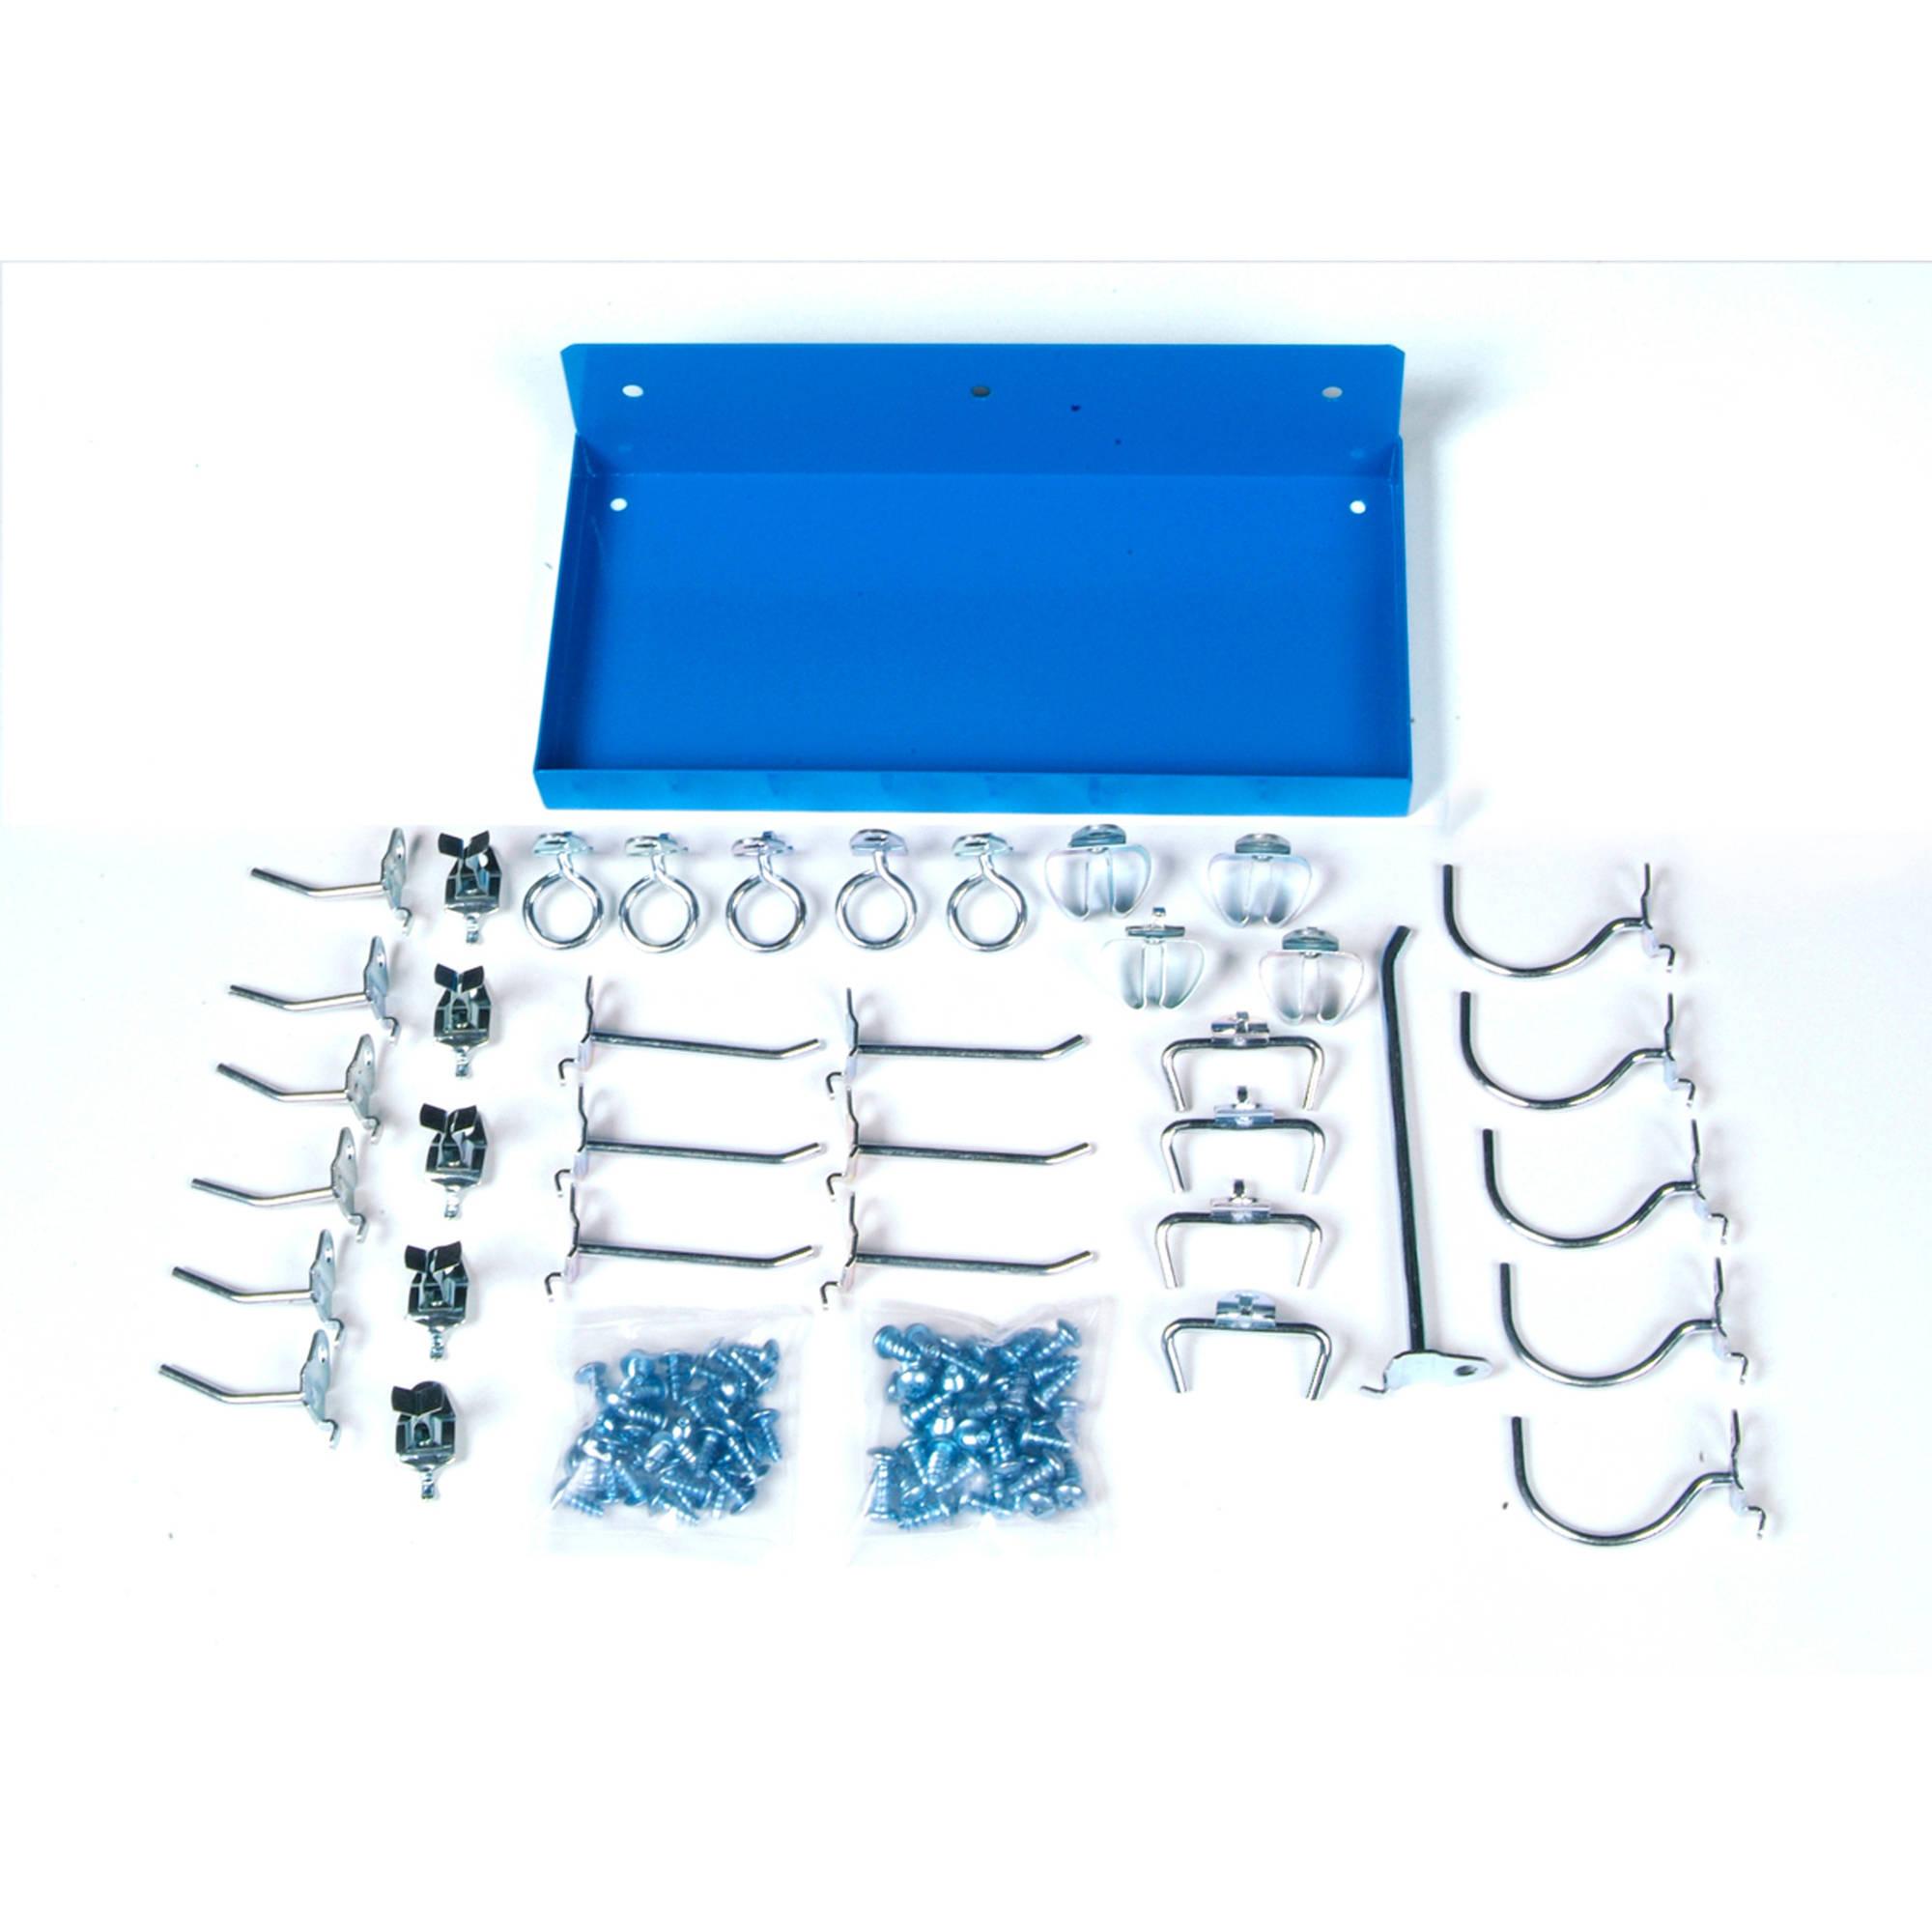 "DuraHook 12""W x 6"" Deep Blue Epoxy Coated Locking Steel Pegboard Shelf with 36-Piece DuraHook Locking Pegboard Hook Assortment"